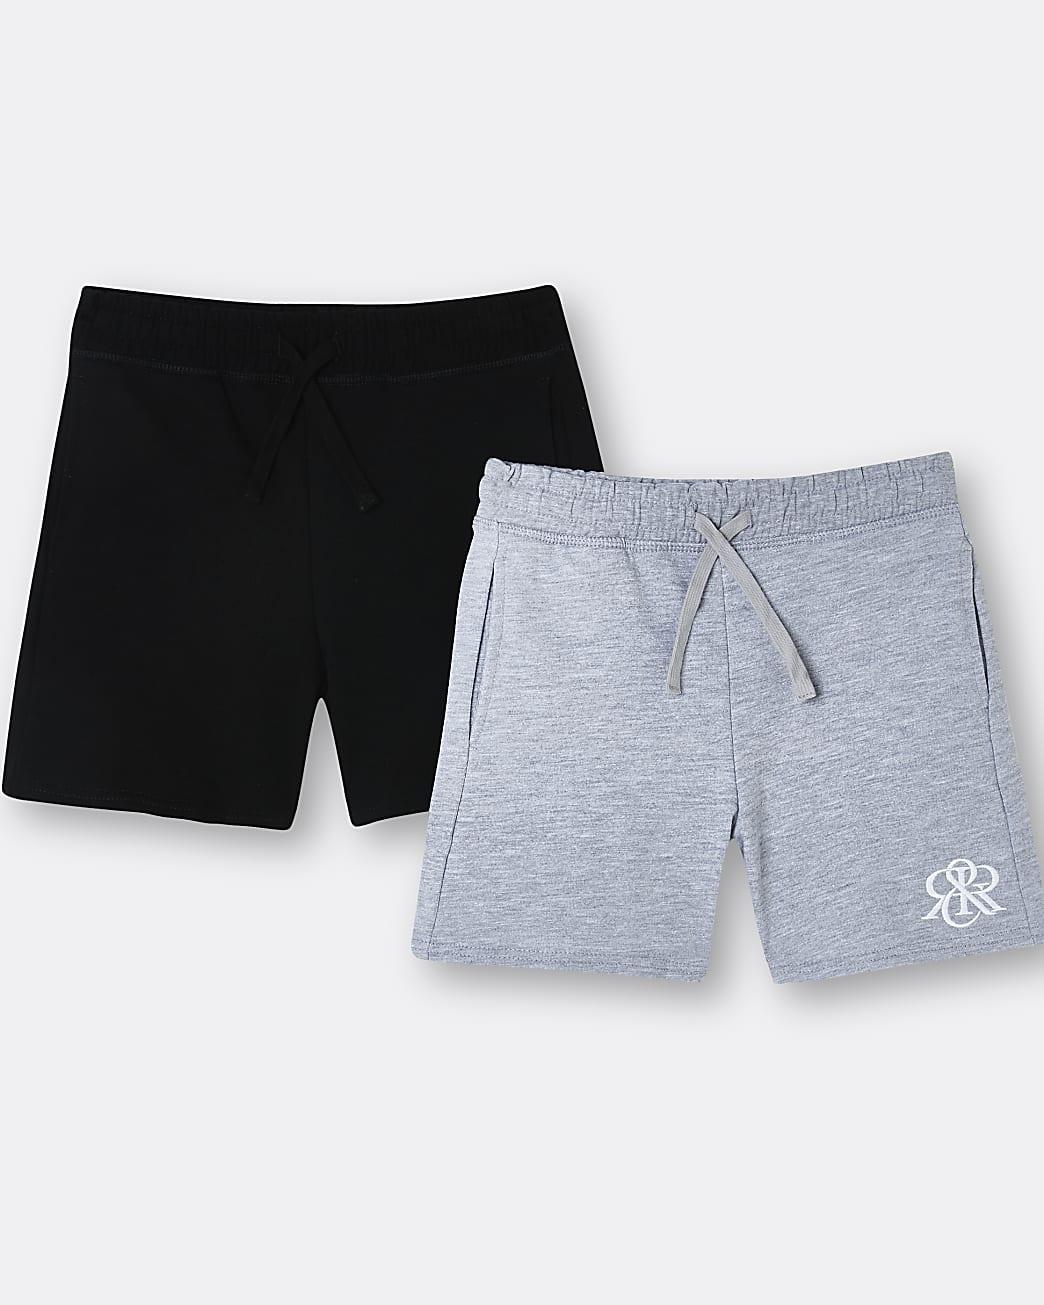 Boys grey RIR shorts 2 pack